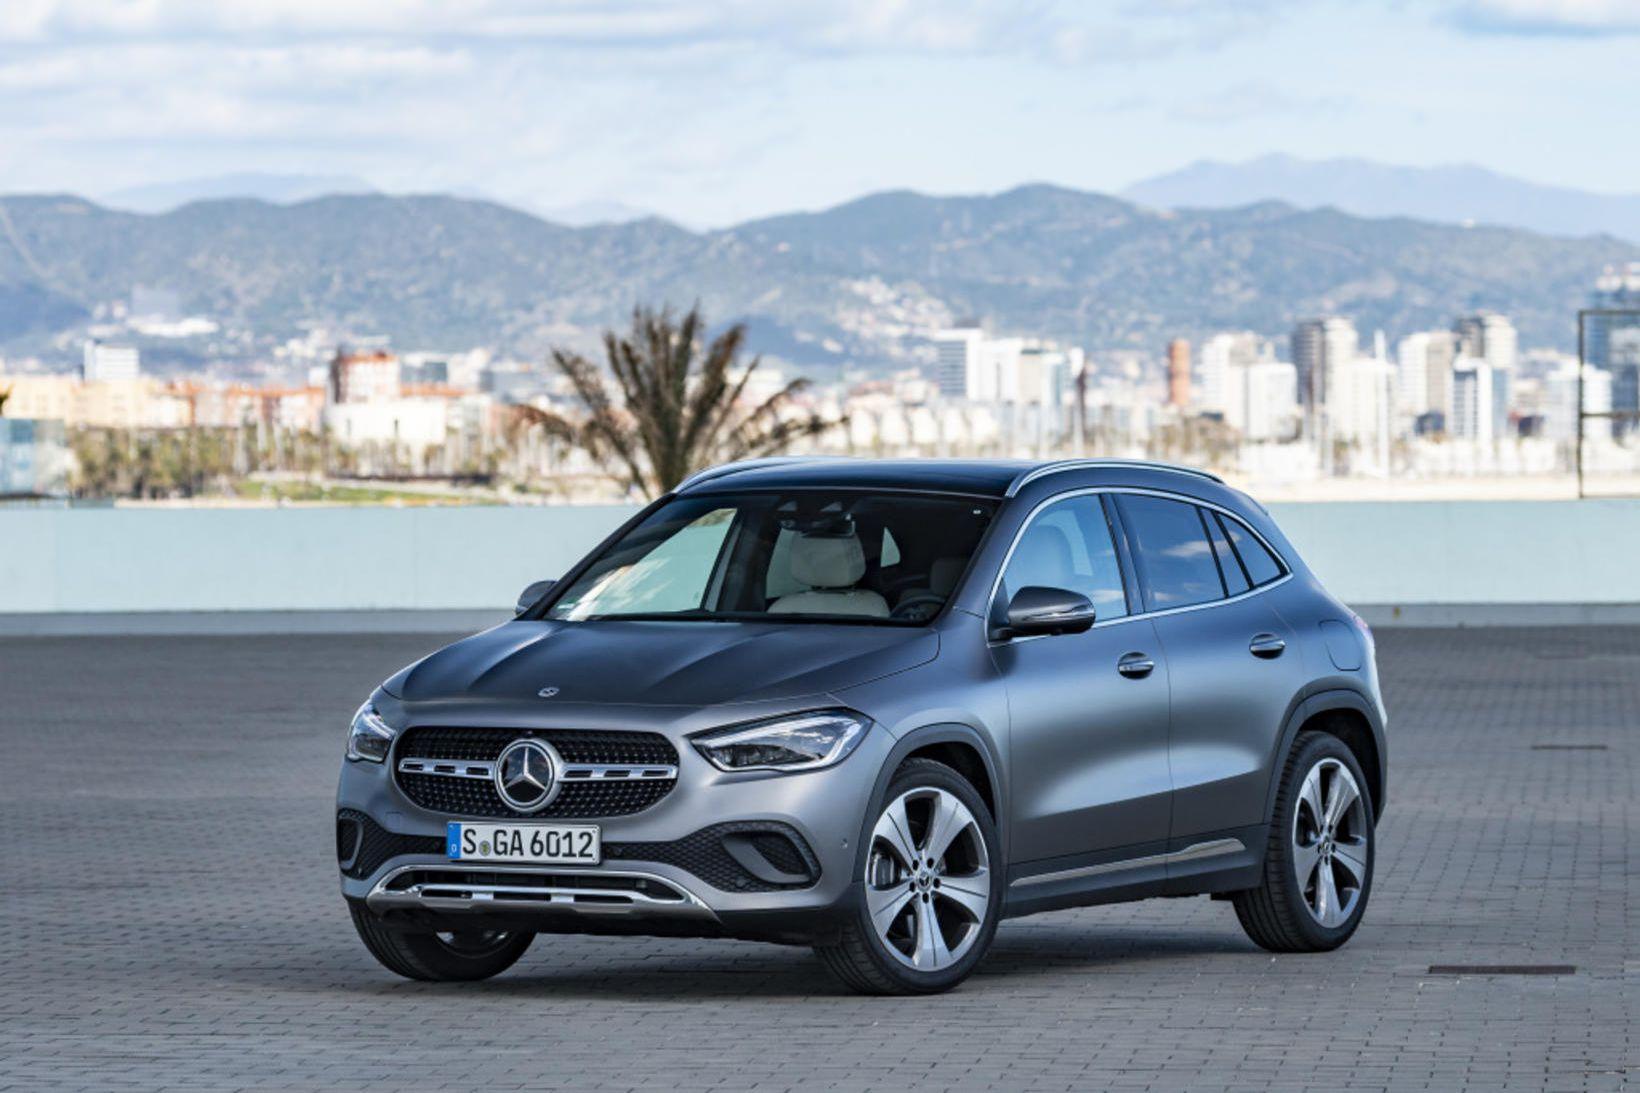 Hinn nýi Mercedes-Benz GLA.